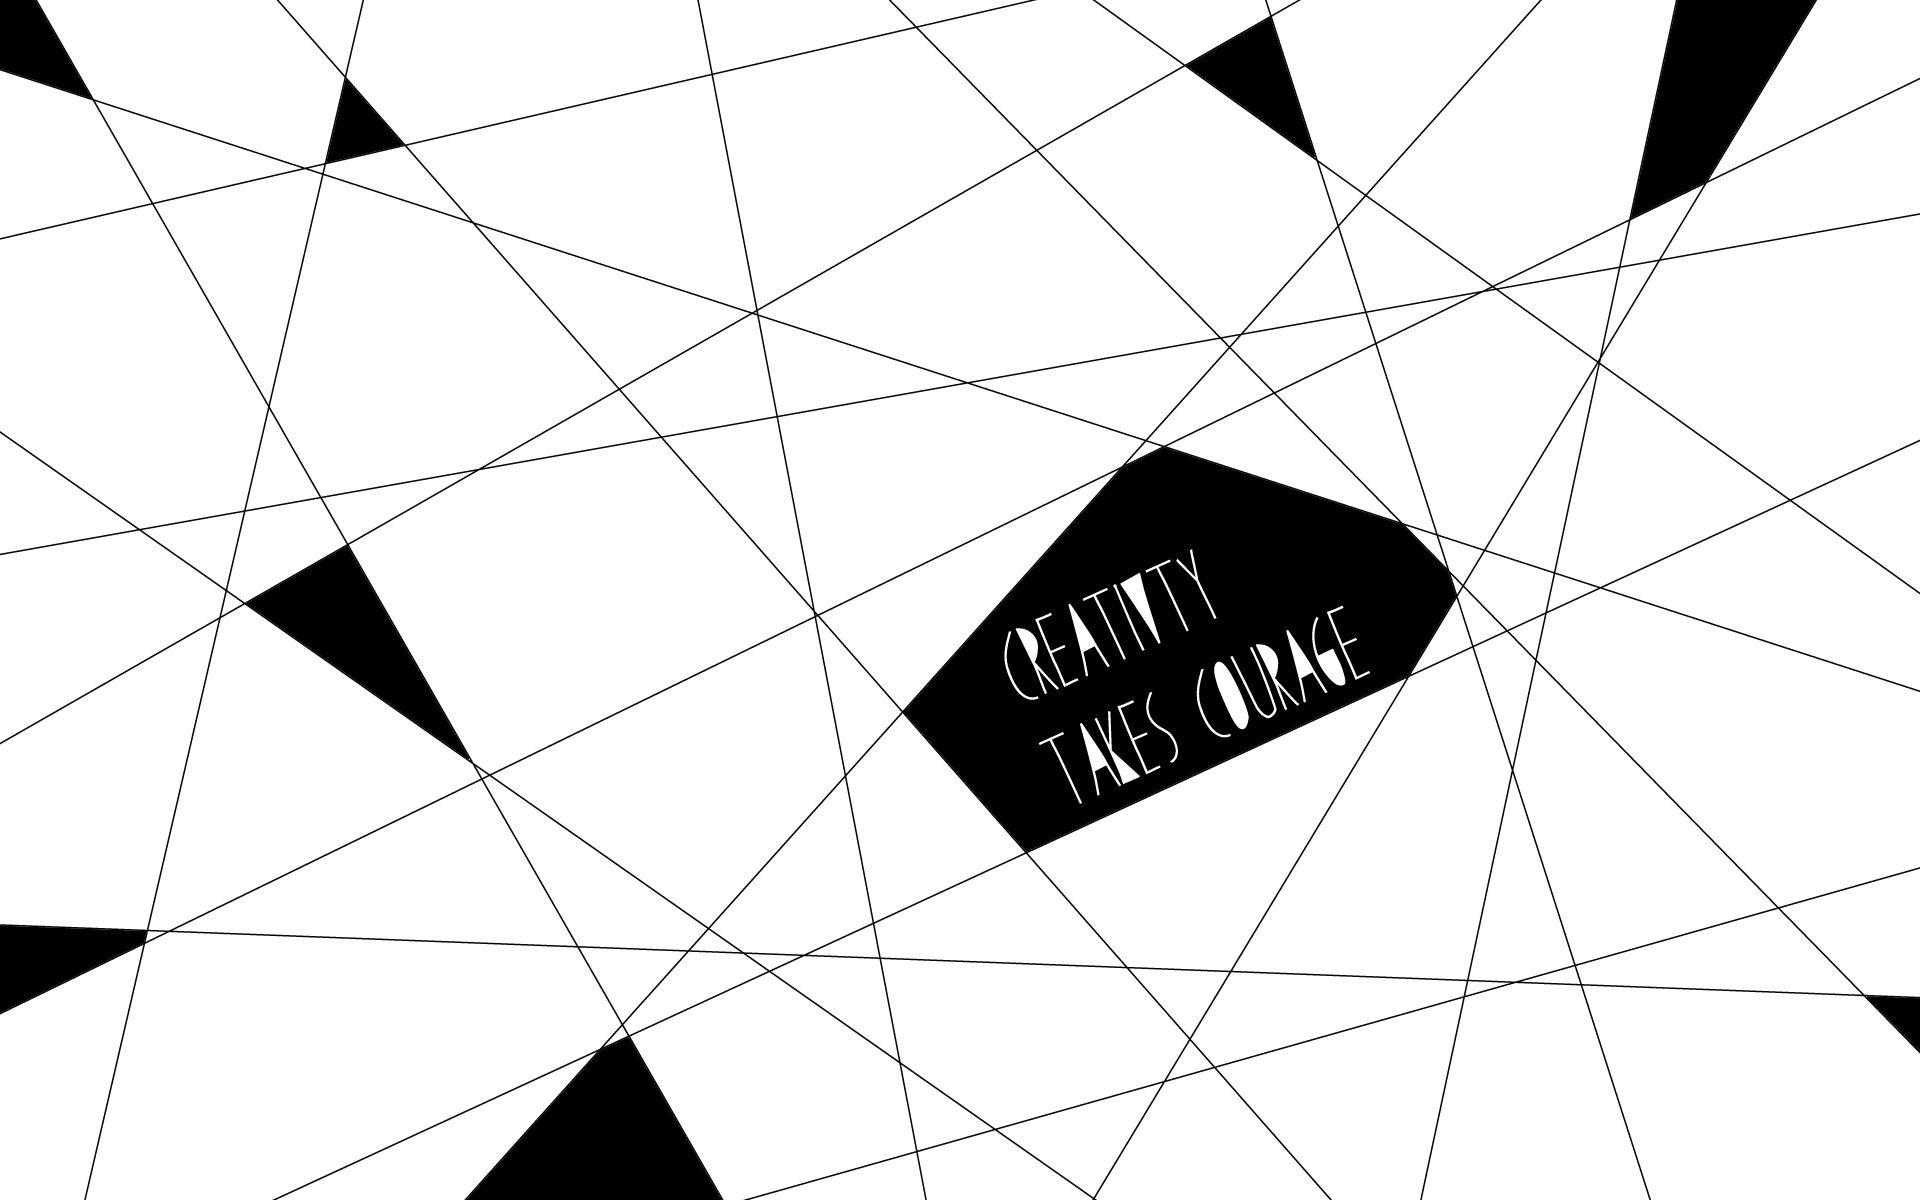 Free Black And White Desktop Designs By Delia Creates